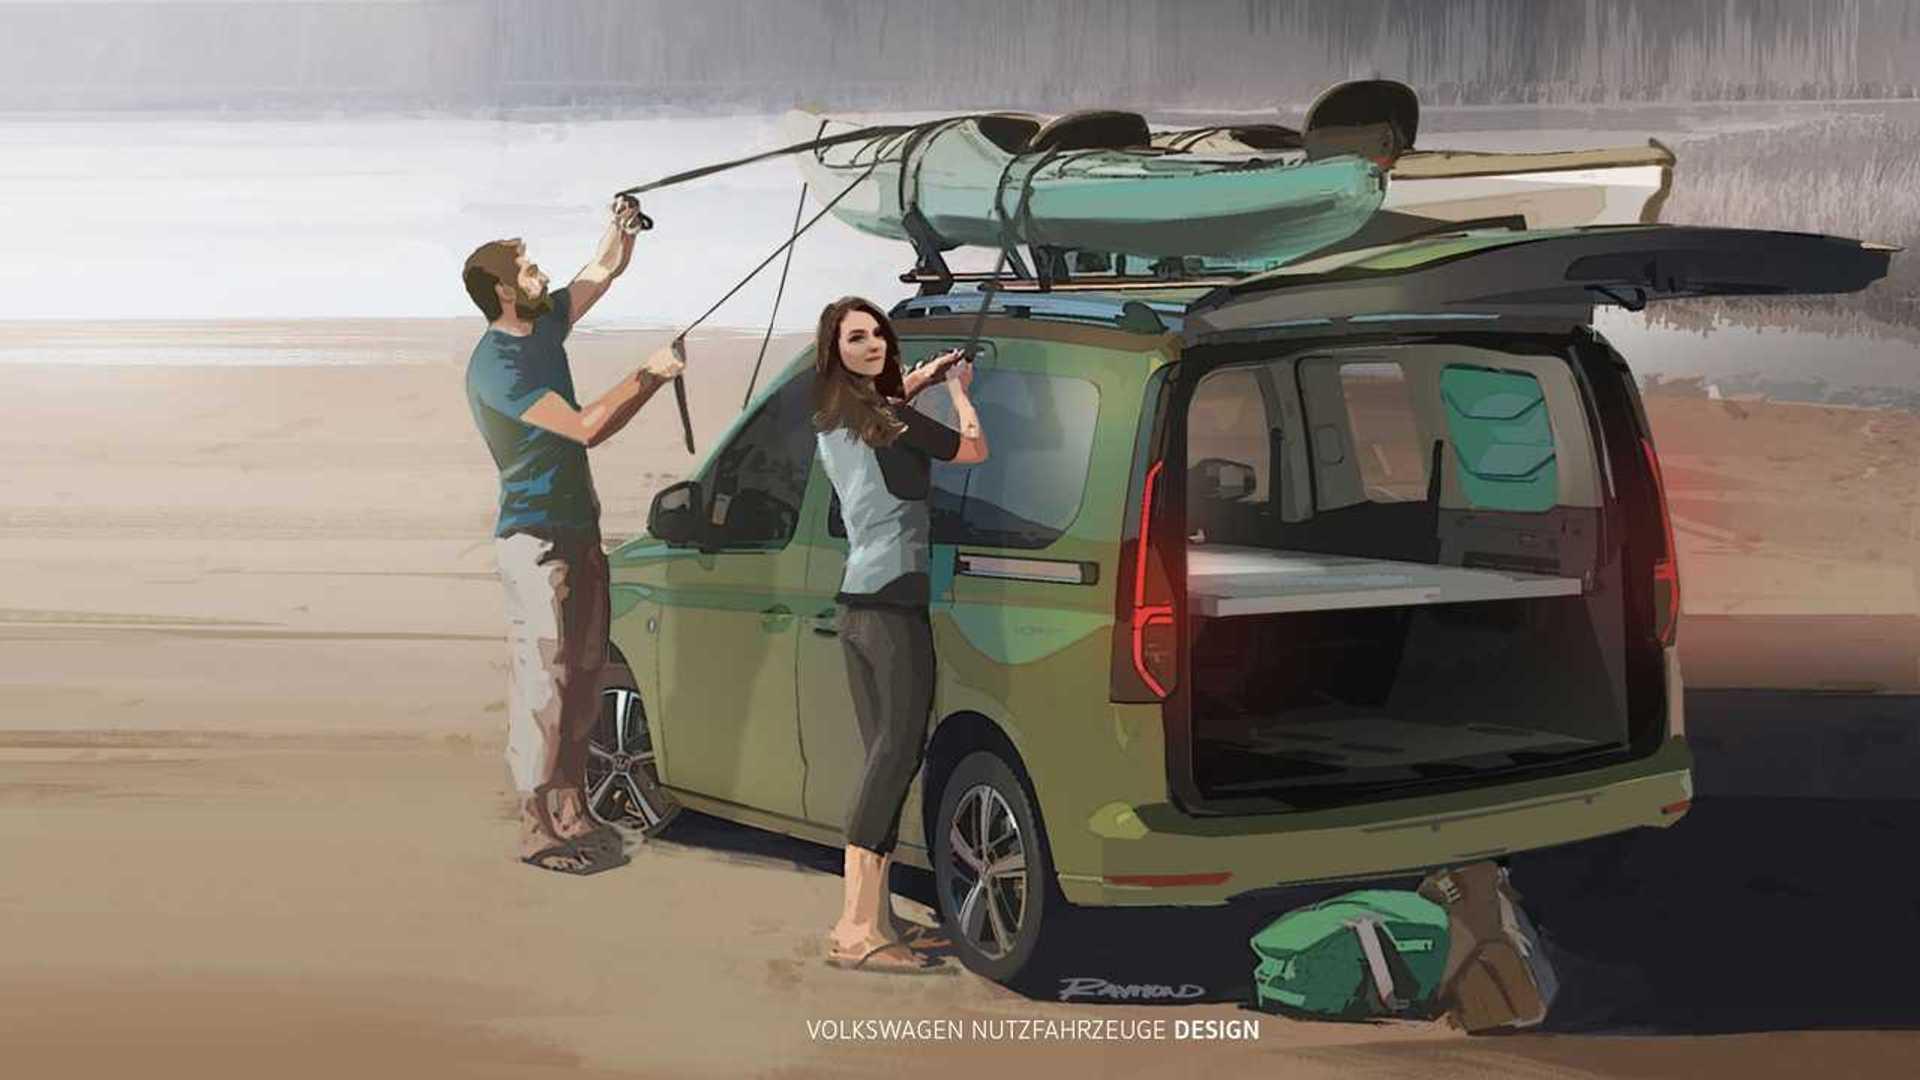 VW Caddy Mini Camper teased as pint-sized motorhome